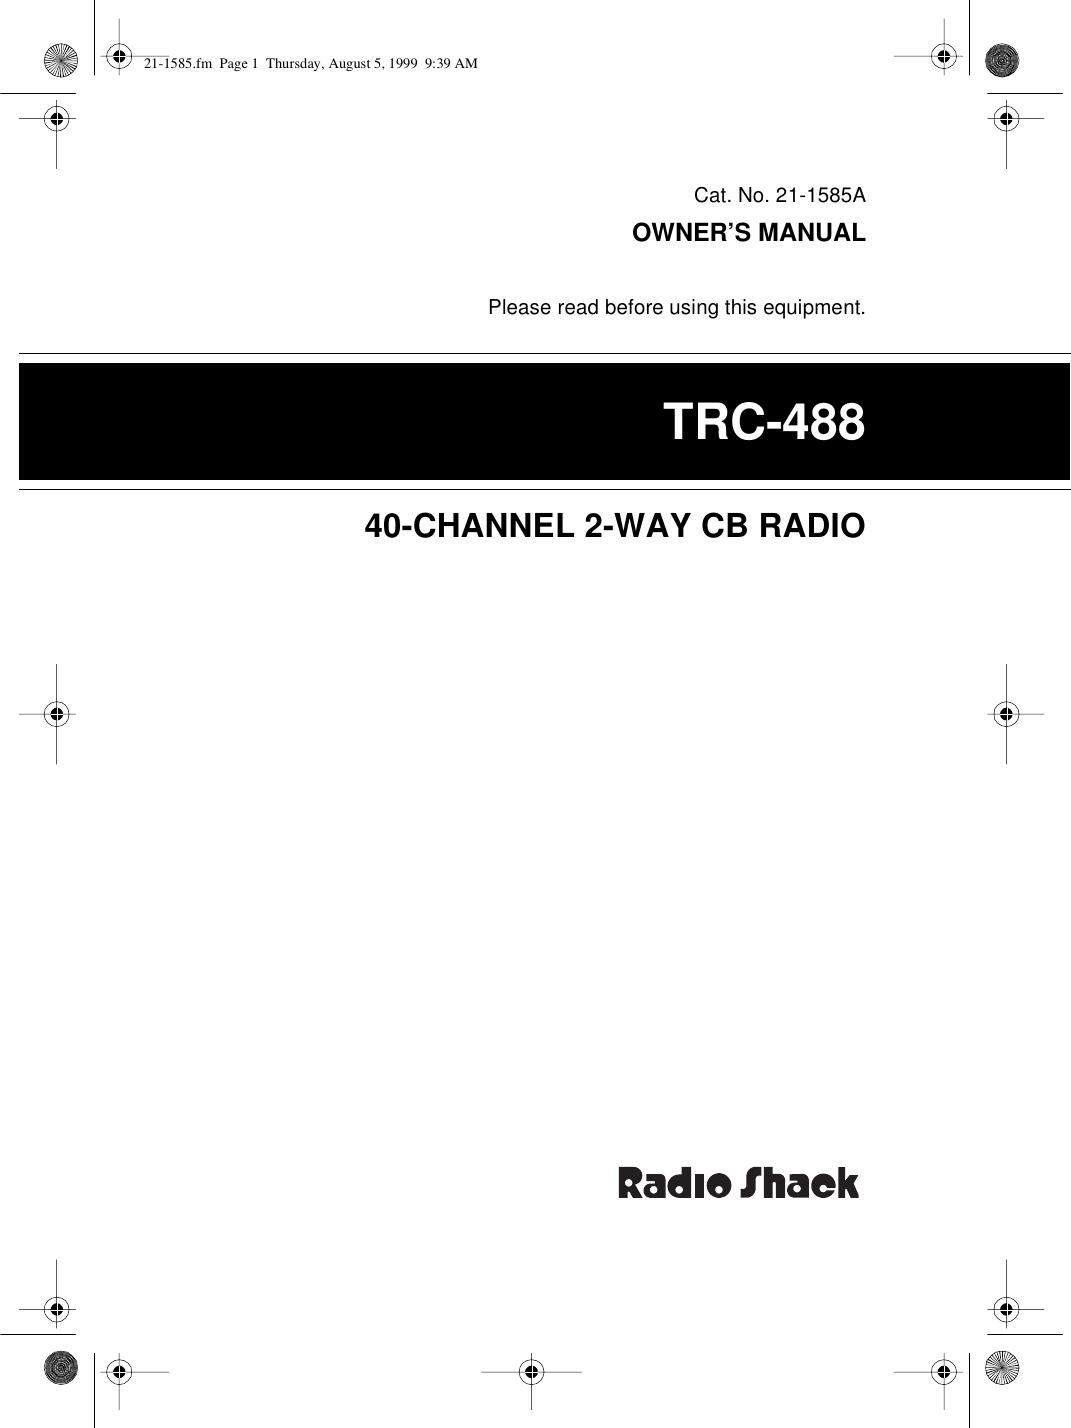 Radio Shack Trc 488 Users Manual 21 1585 Cb Mic Wiring